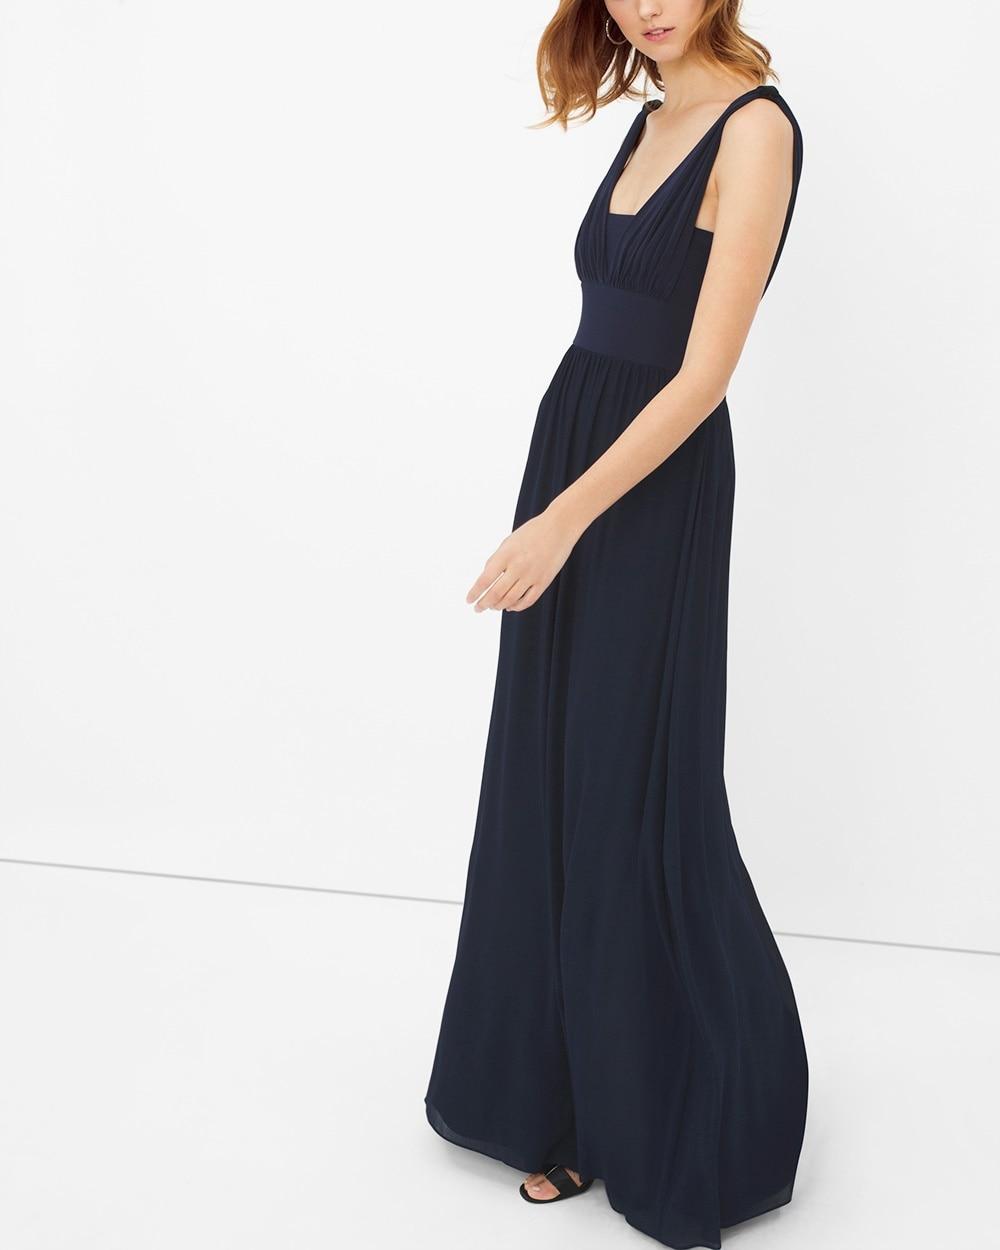 Genius Chiffon Convertible Navy Gown - White House Black Market